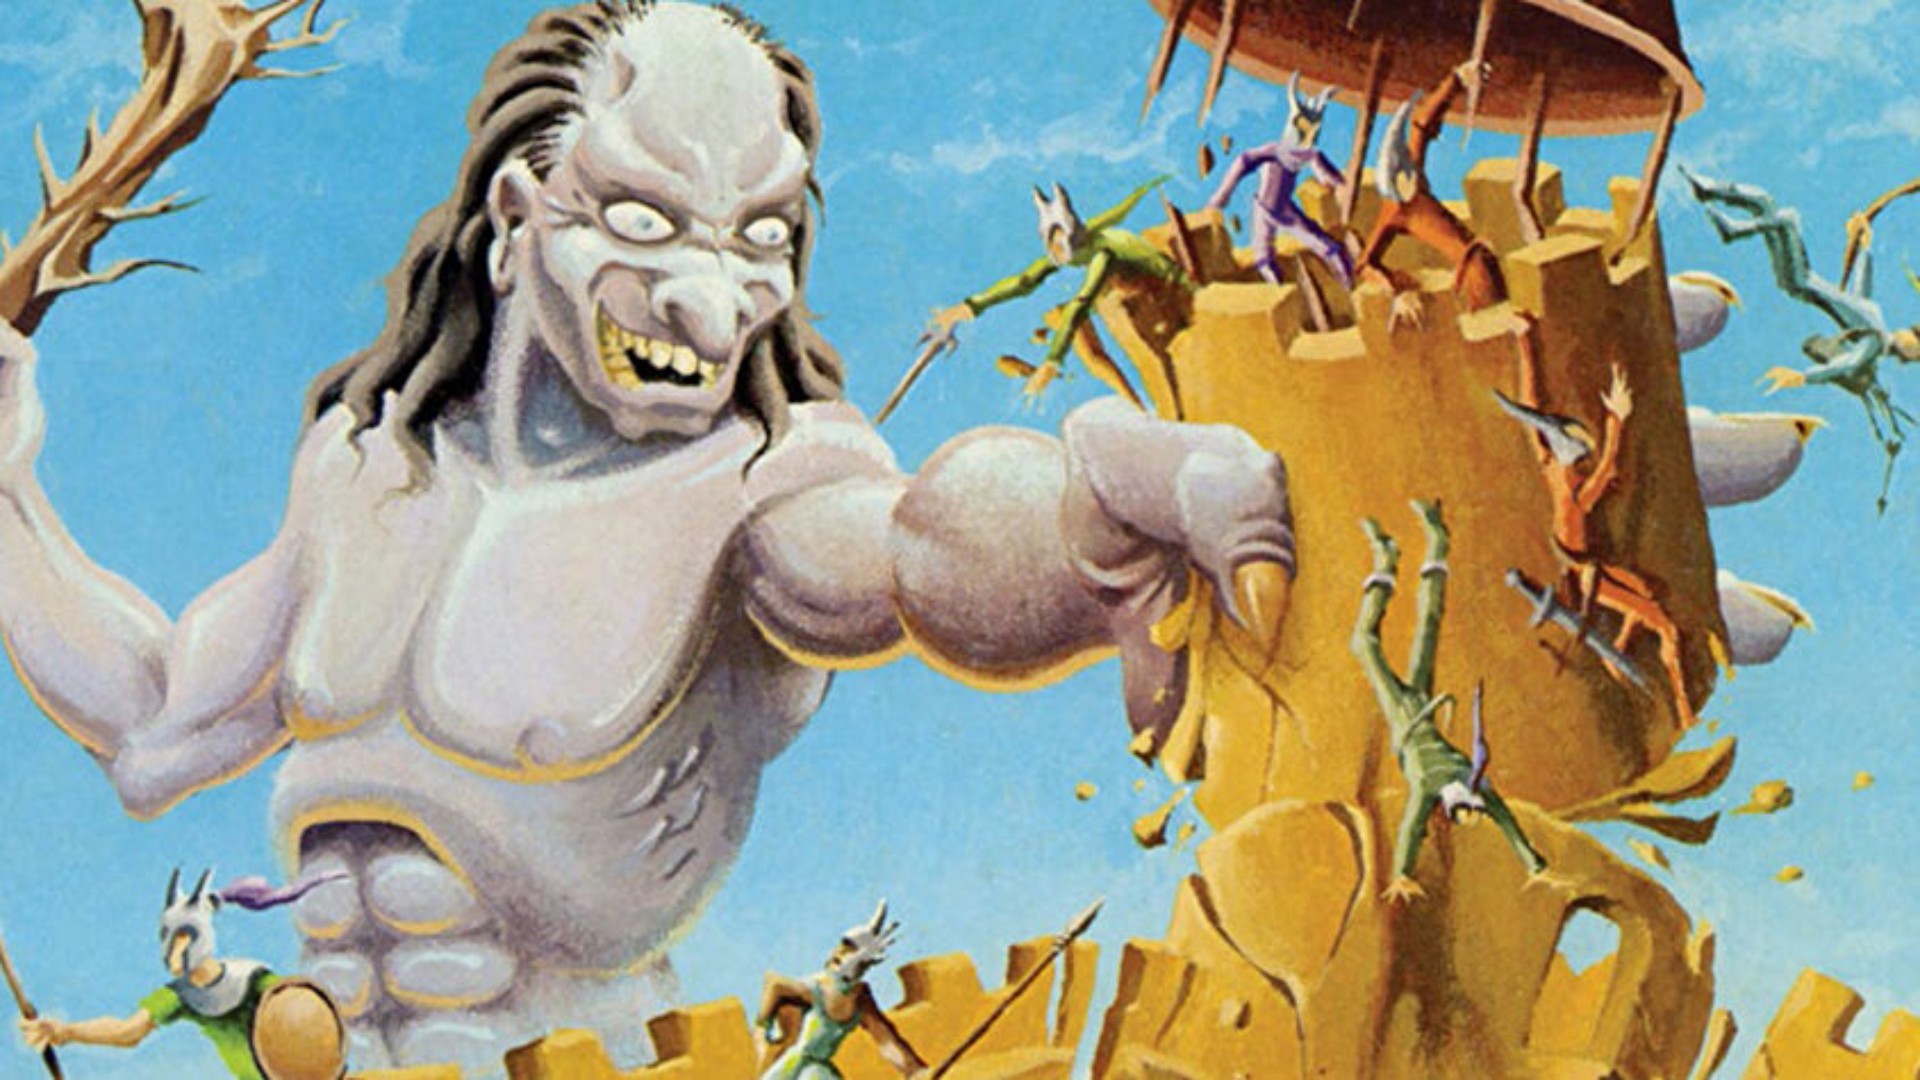 Castle Amber Dungeons & Dragons RPG adventure artwork